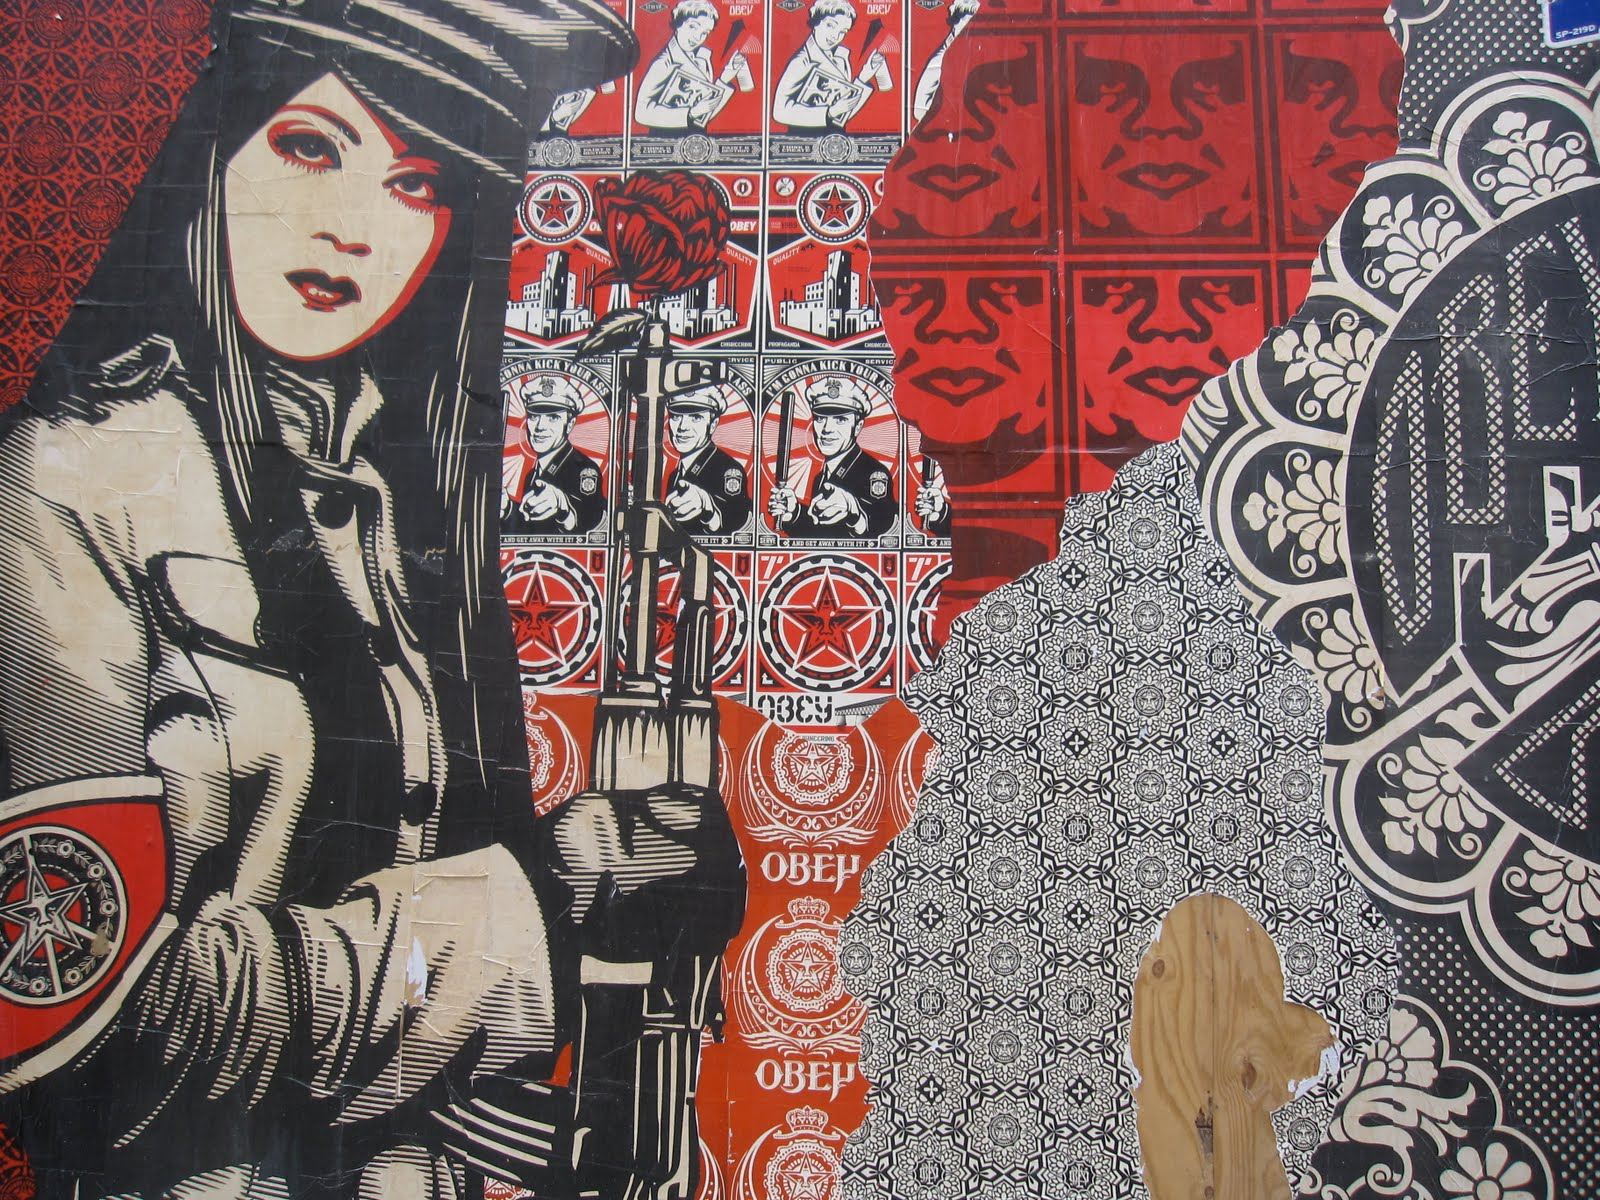 shepard fairey wallpaper  HD Photo Wallpaper Collection HD WALLPAPERS 1600x1200